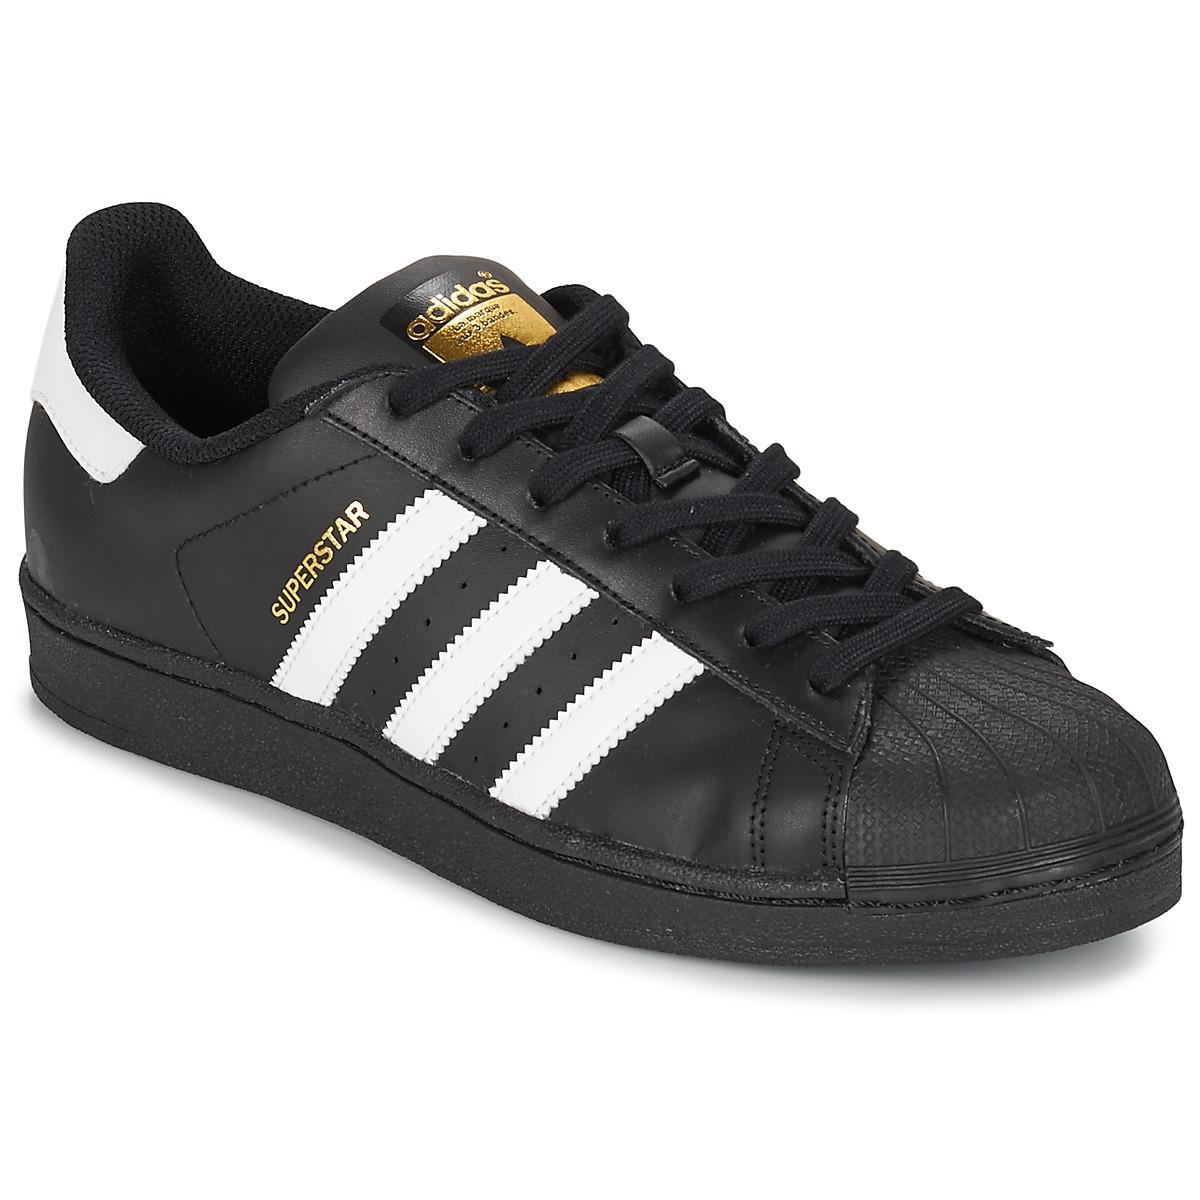 Adidas online shop us